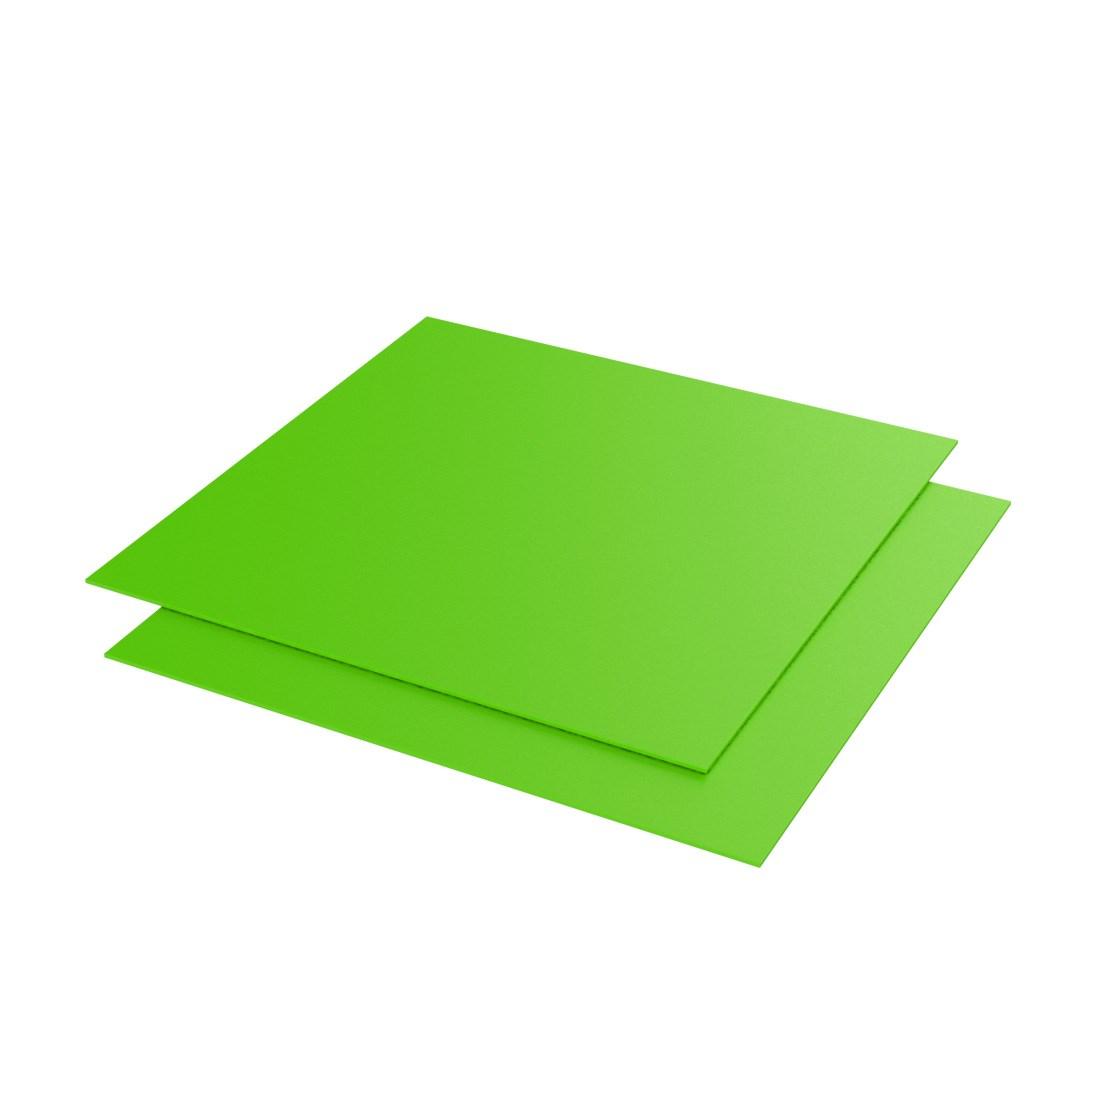 Vikunyl PVC Groen 7100 Mat 1300x1000x0,2mm